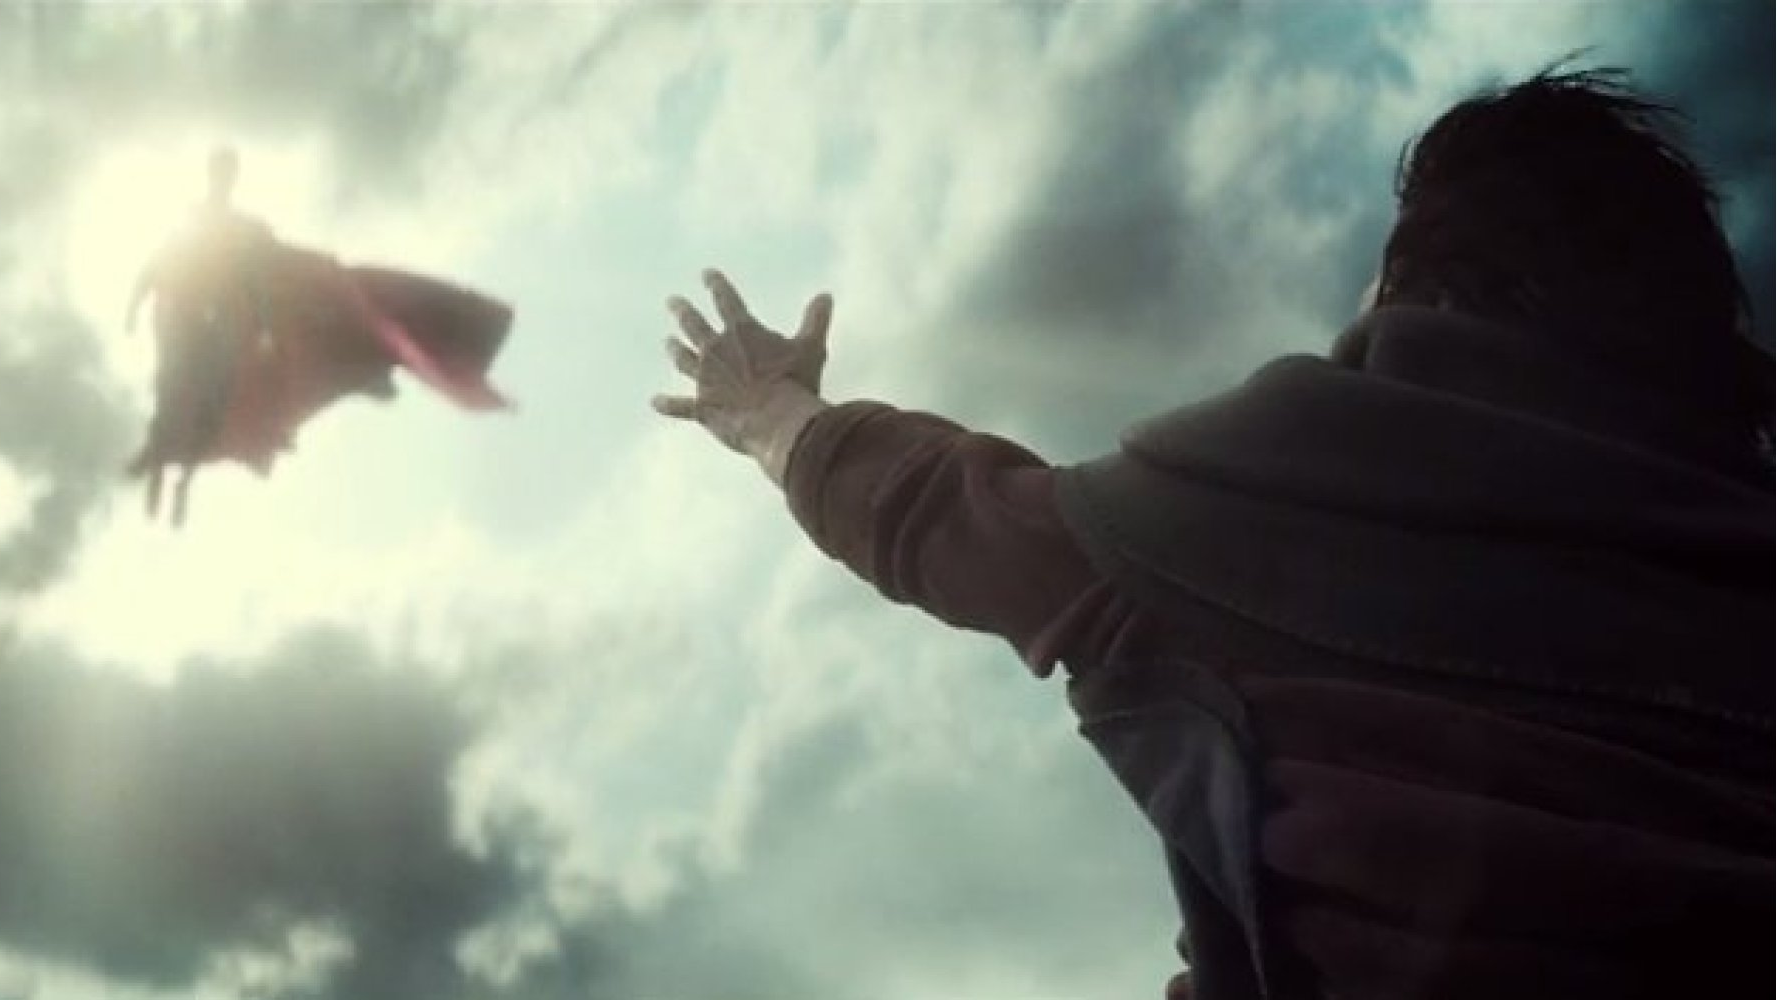 Shazam!'s Director Made His Own Batman V. Superman Parody Mashup